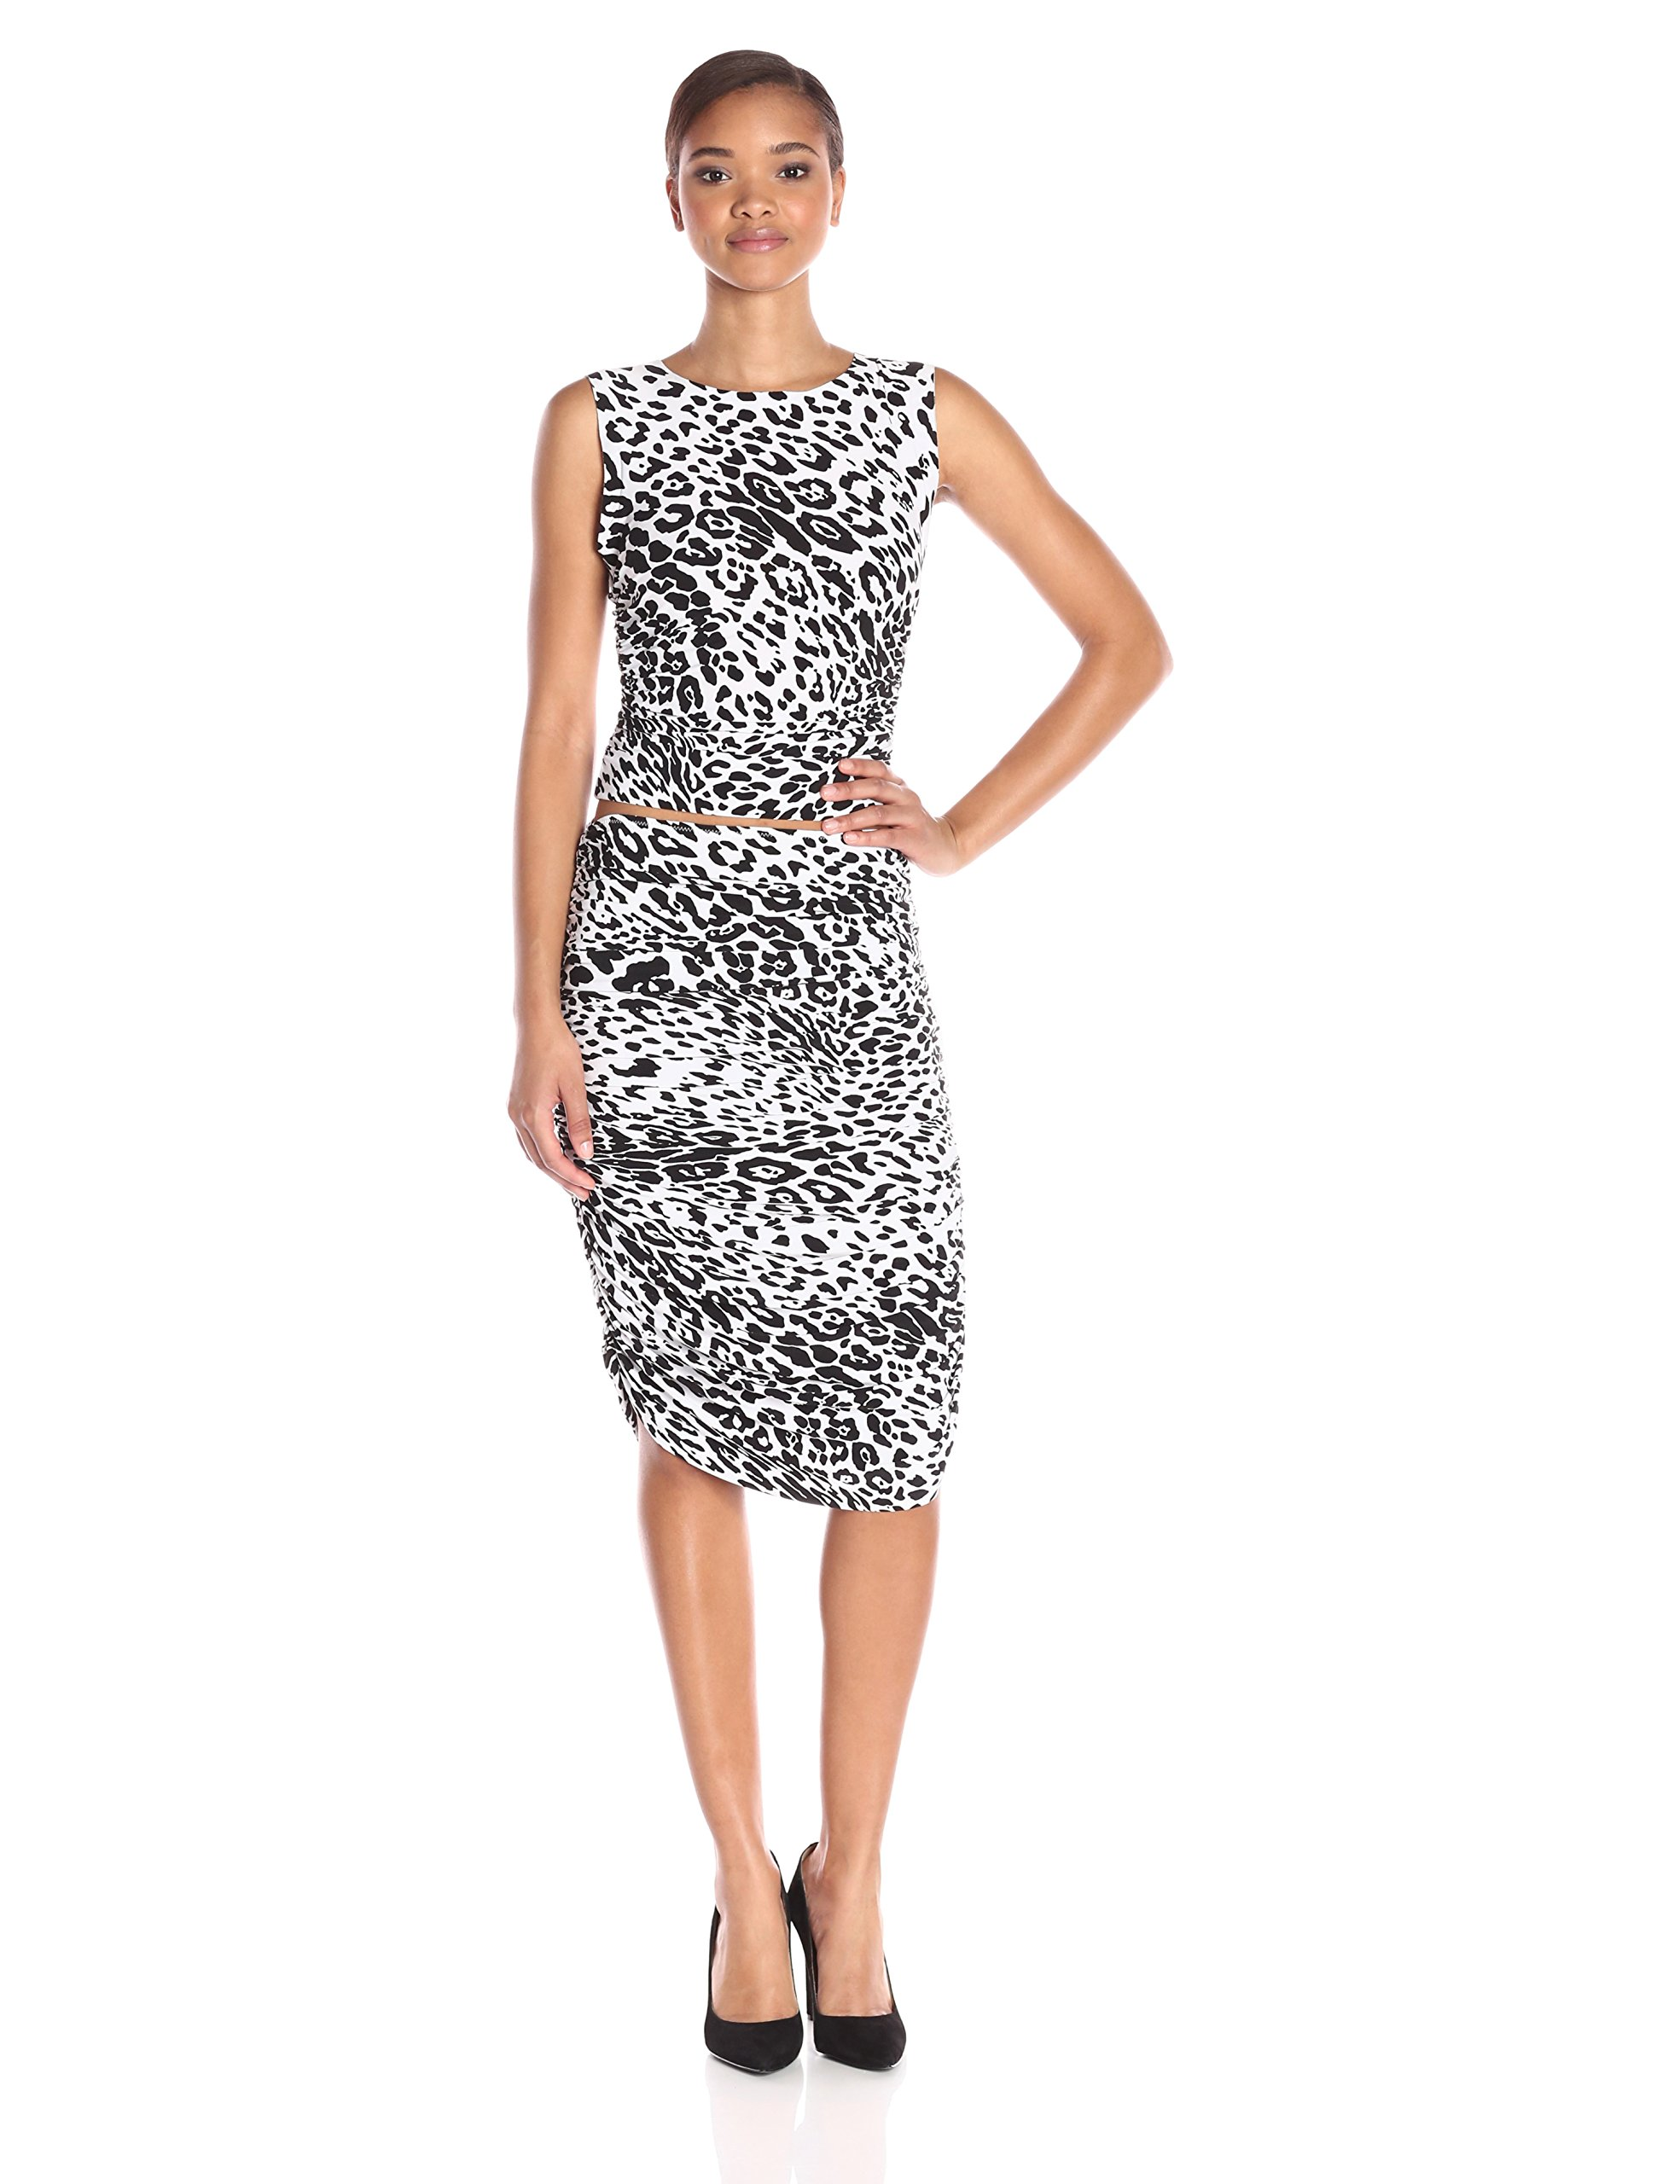 Norma Kamali Women's teaser Dress Two Piece Set, Leopard, Medium by Norma Kamali